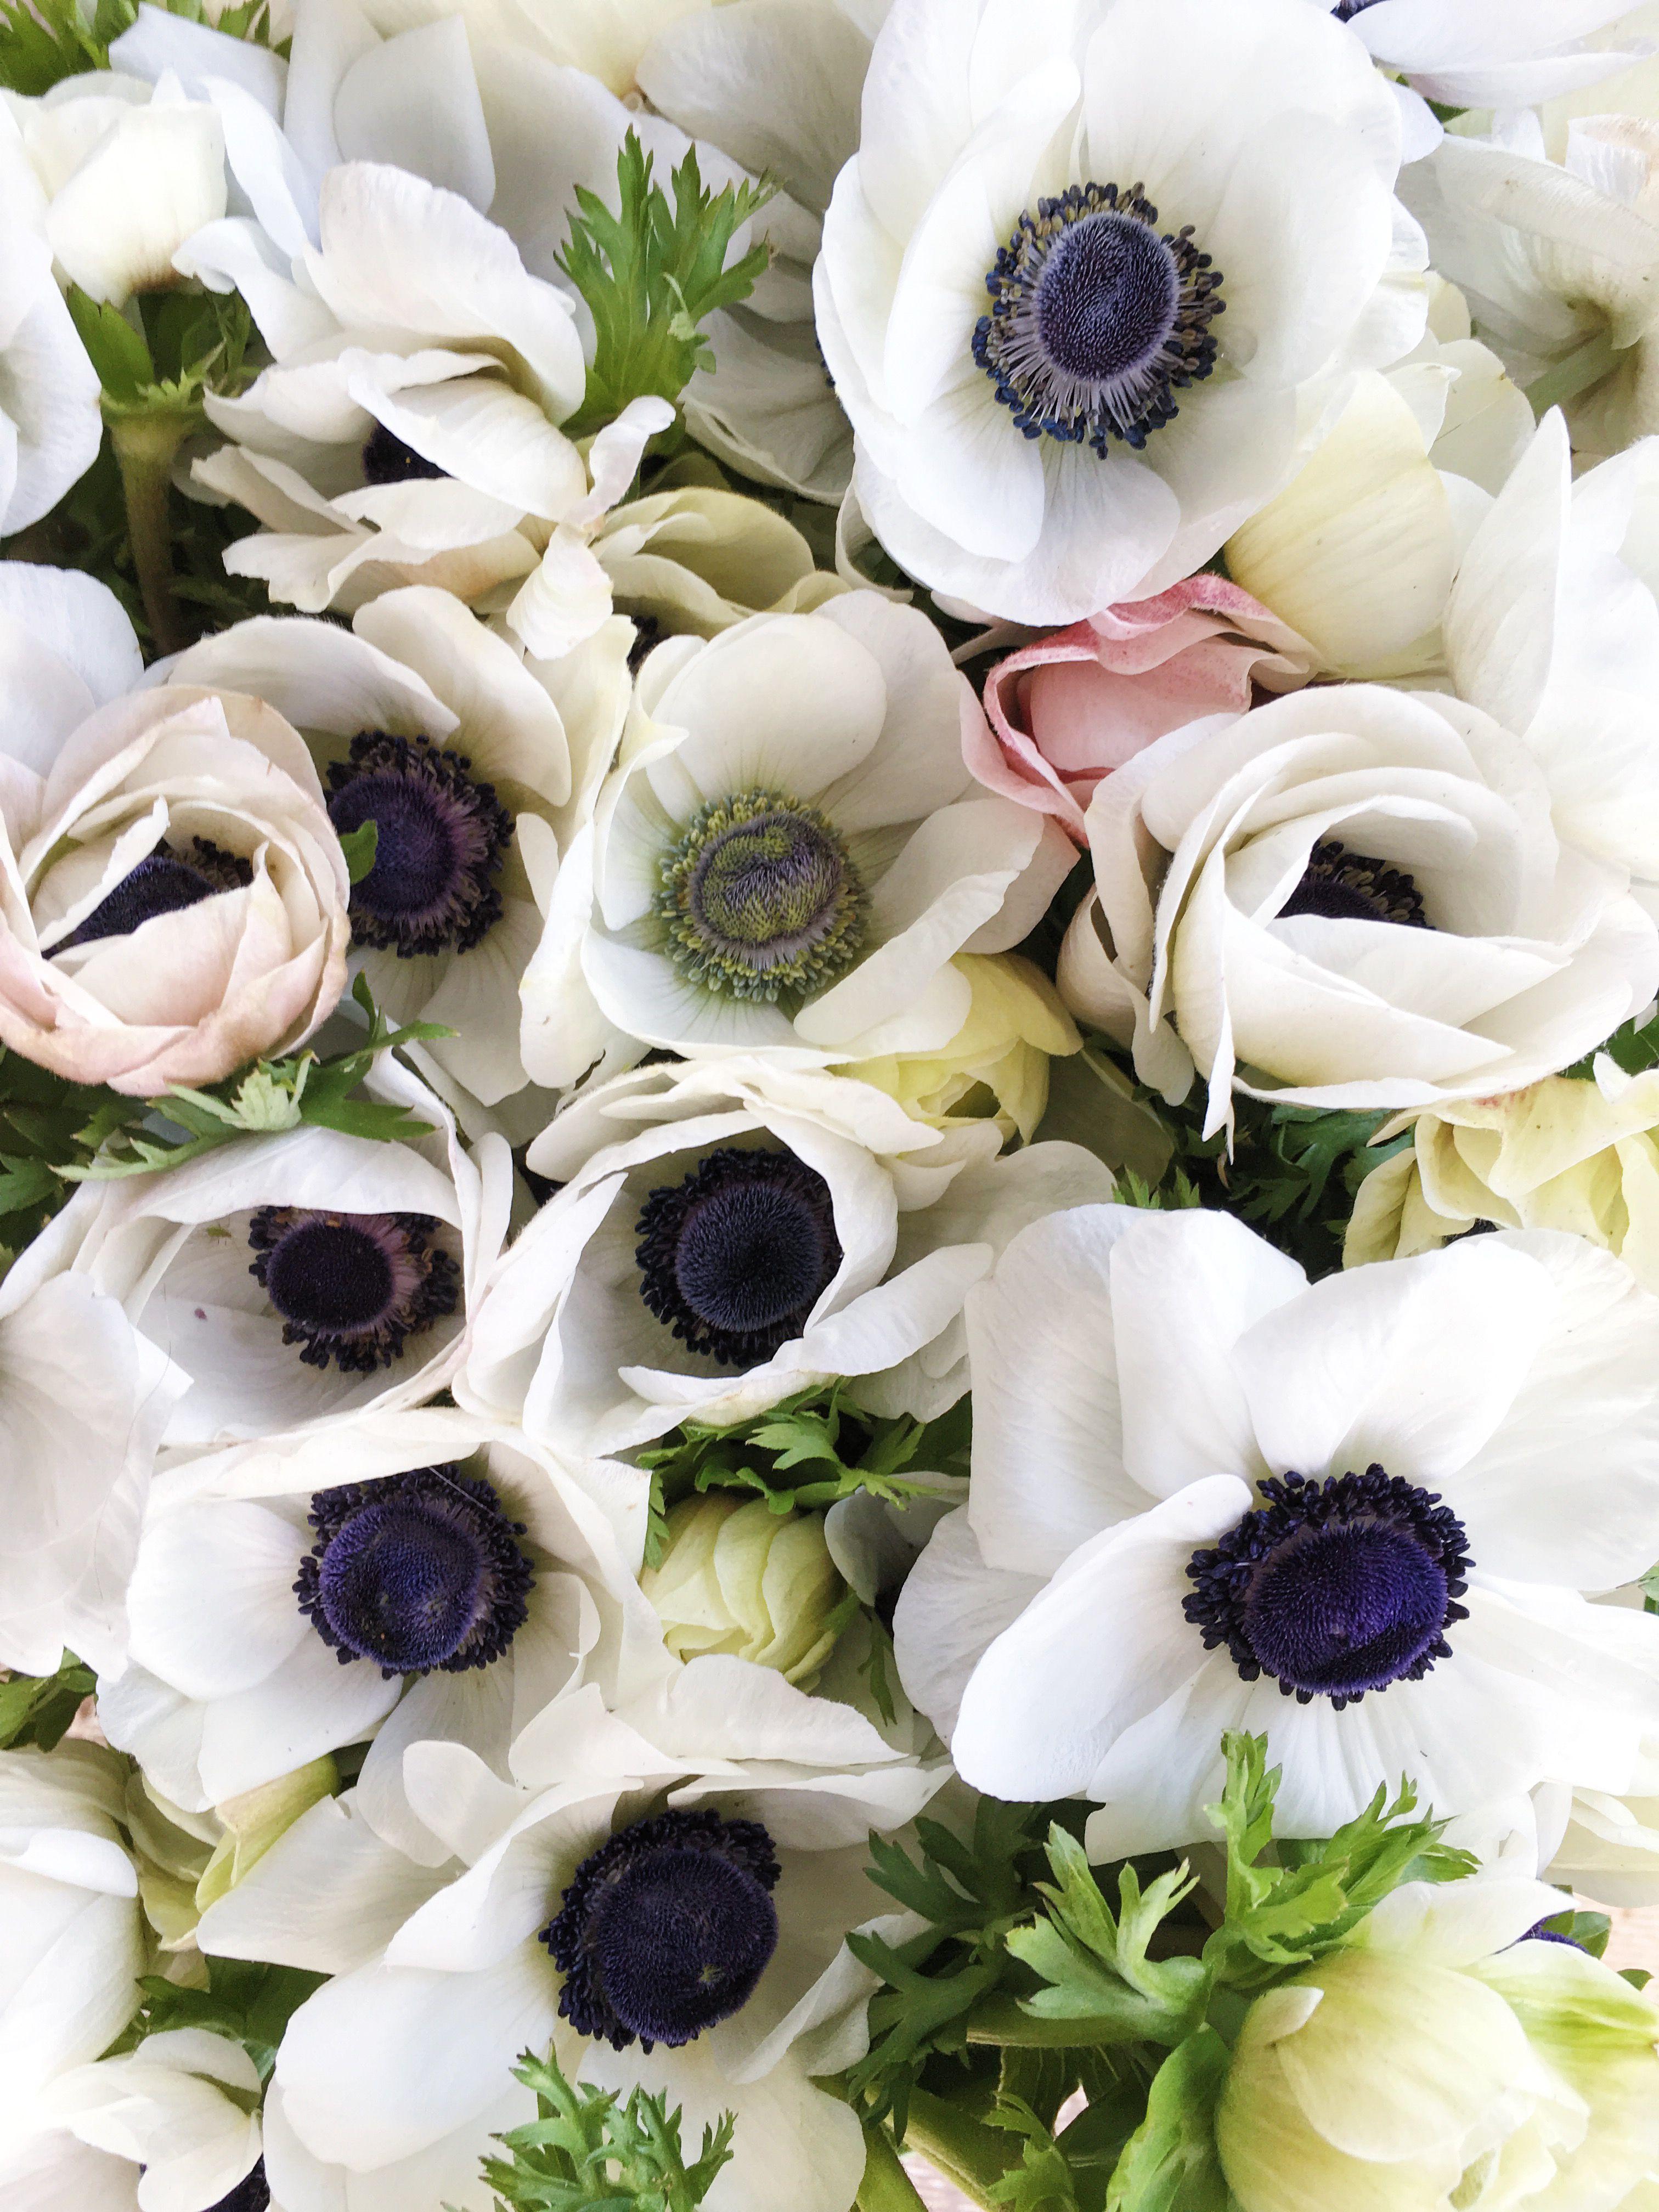 White Anemones With Black Eyes Grown At Love N Fresh Flowers Flower Farm May Flowers April Flowers